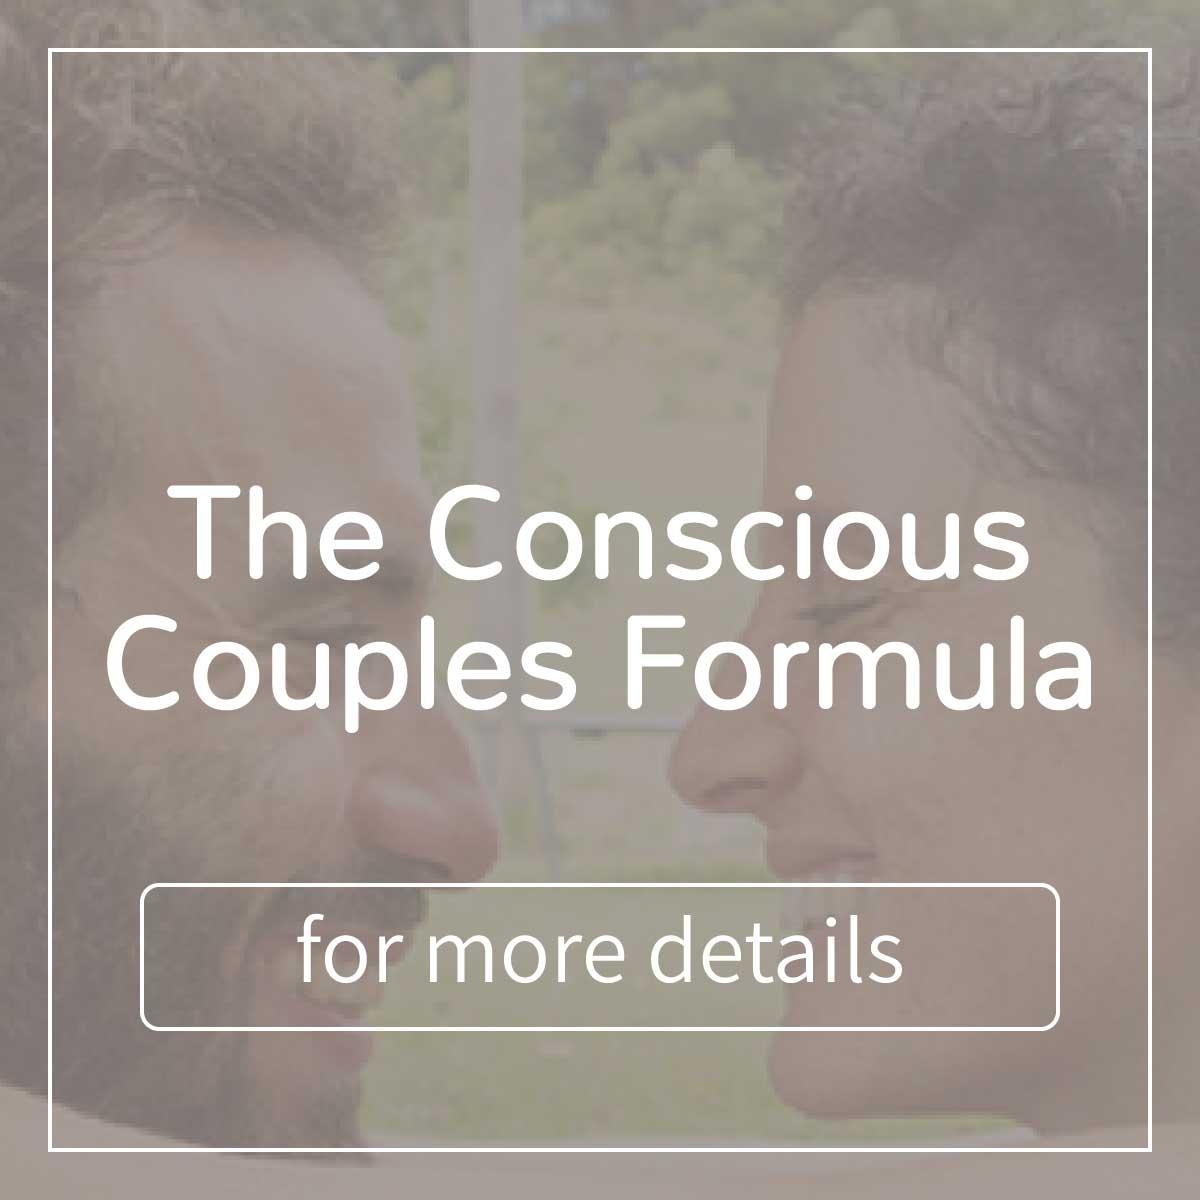 The Conscious Couples Formula